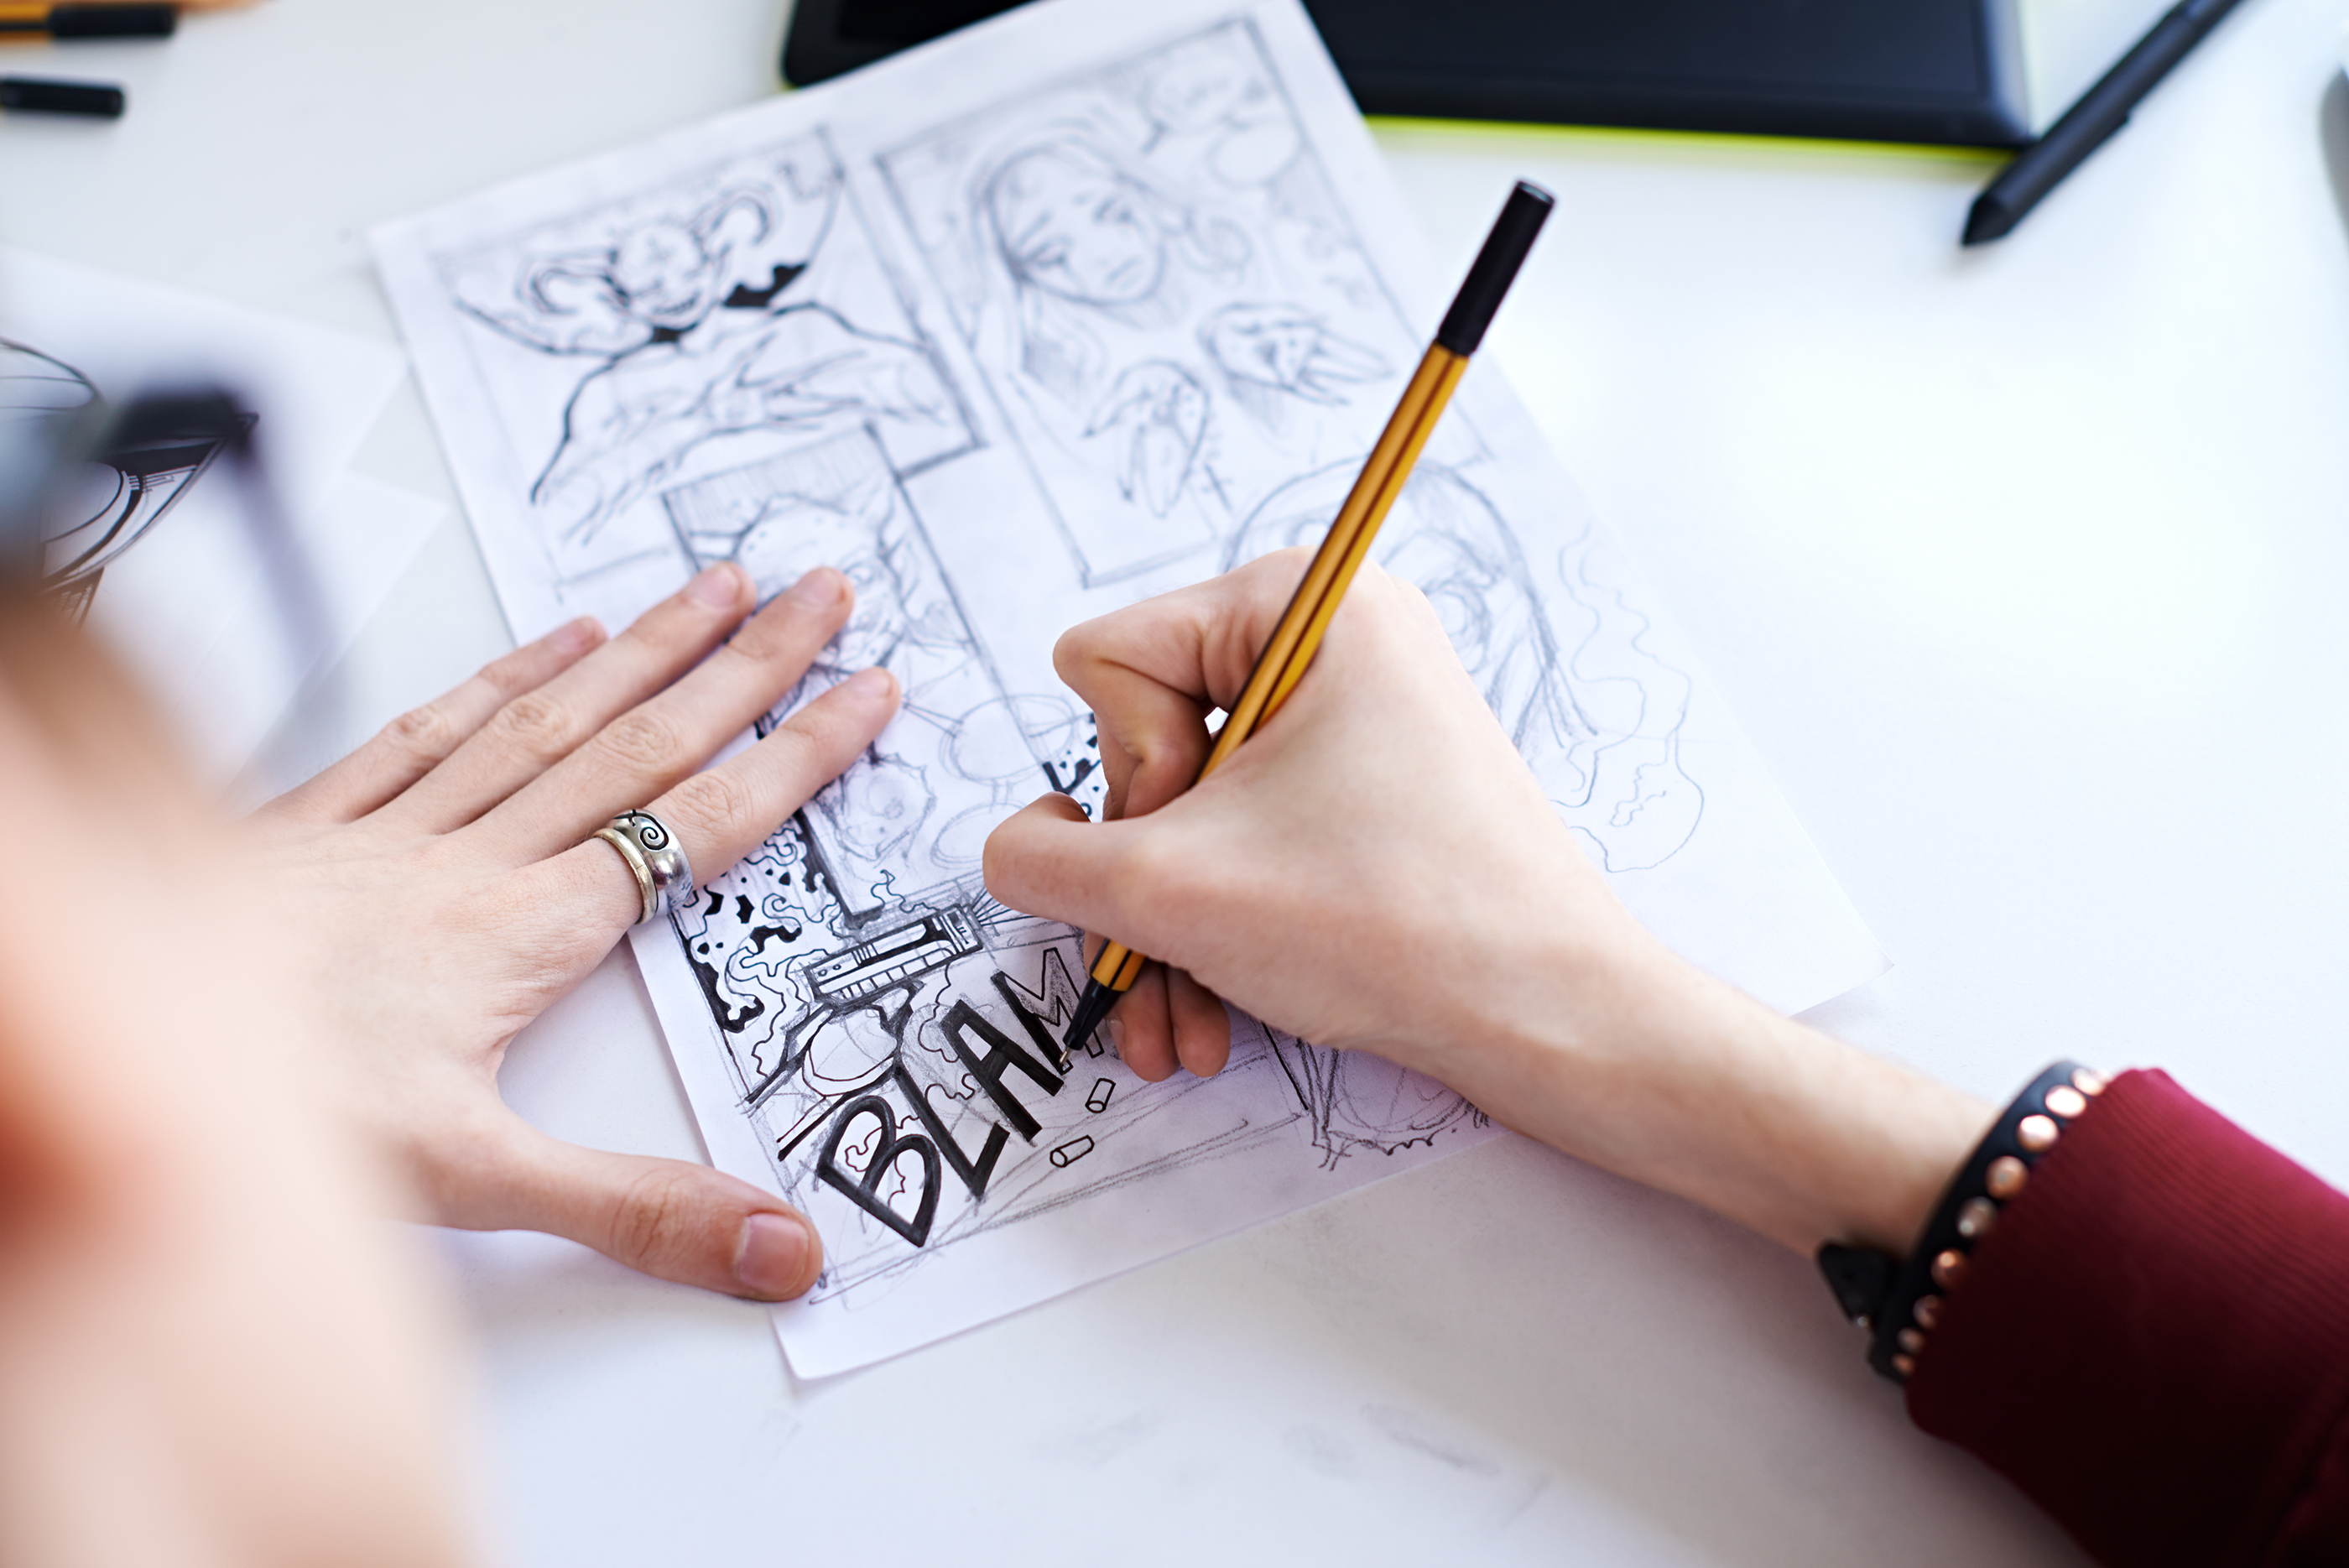 171102-comic-book-inking